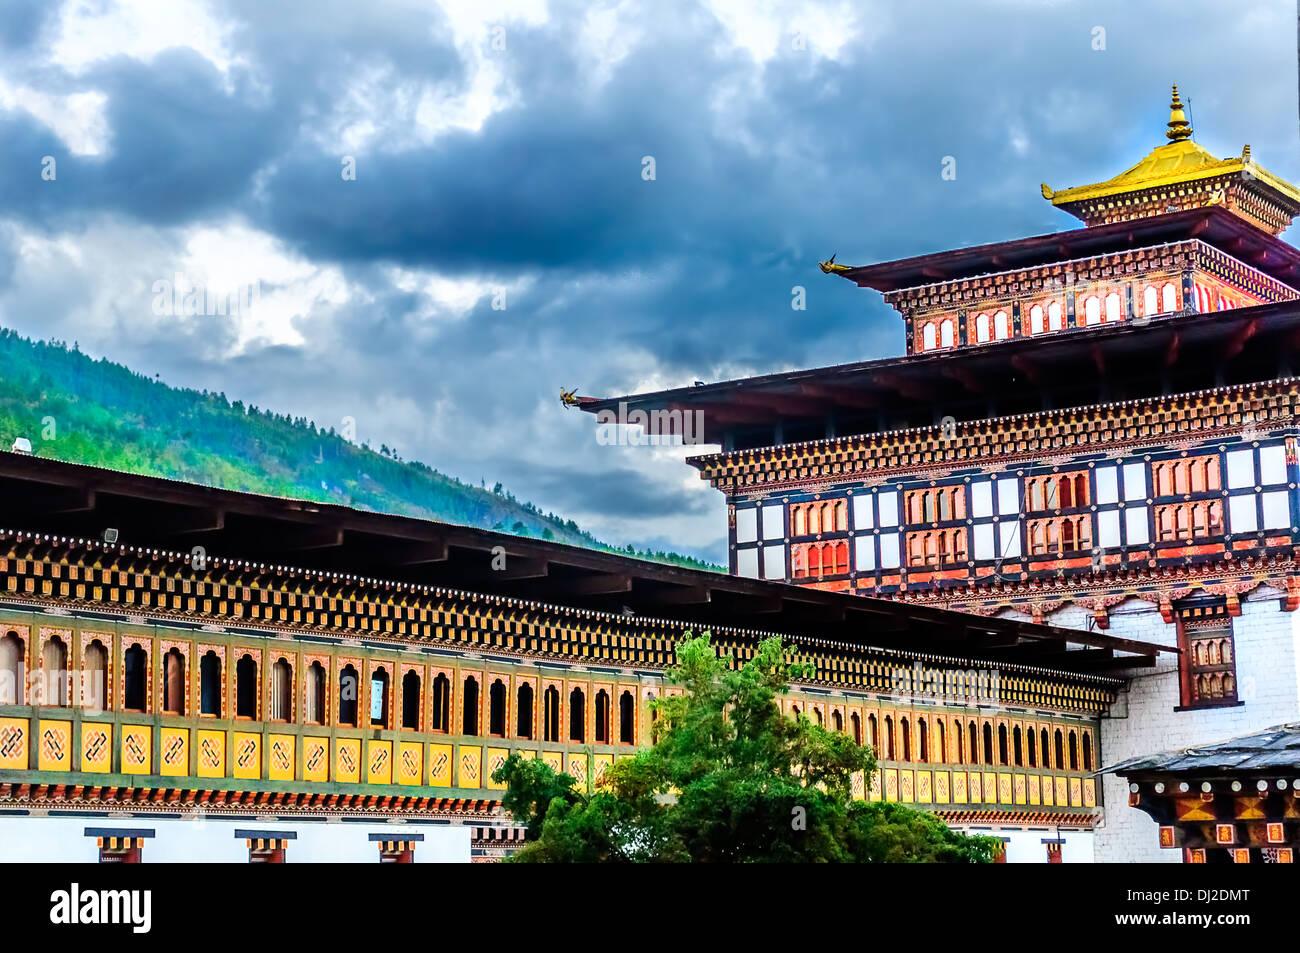 Bhutan Landmark Tashichho Dzong, Fortress, Administrative center, Royal Government of Bhutan, Thimphu, Capital city, - Stock Image